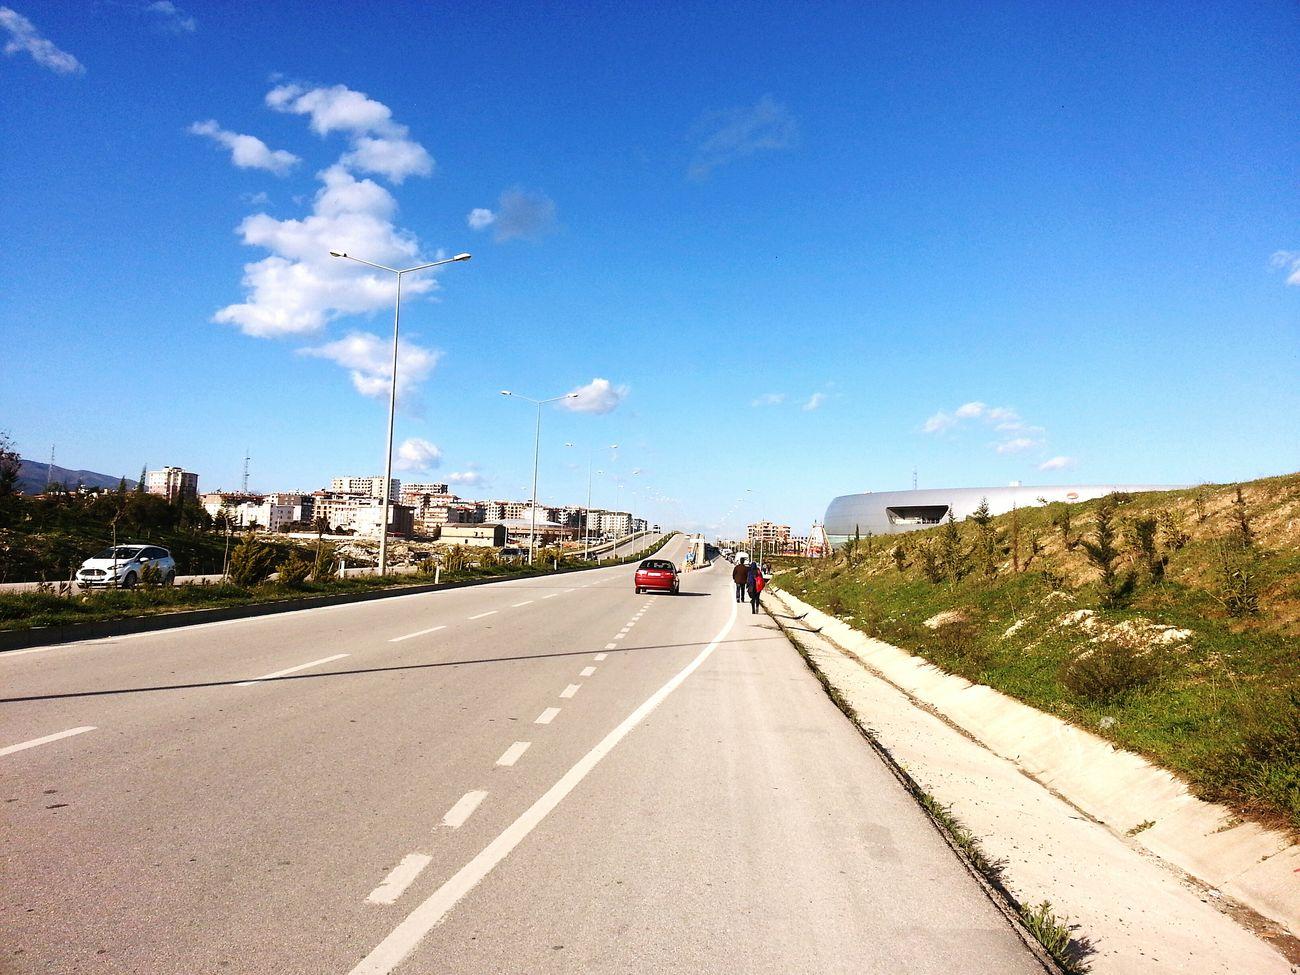 Street Streetphotography Primemall Antakya Otogar By My Cam